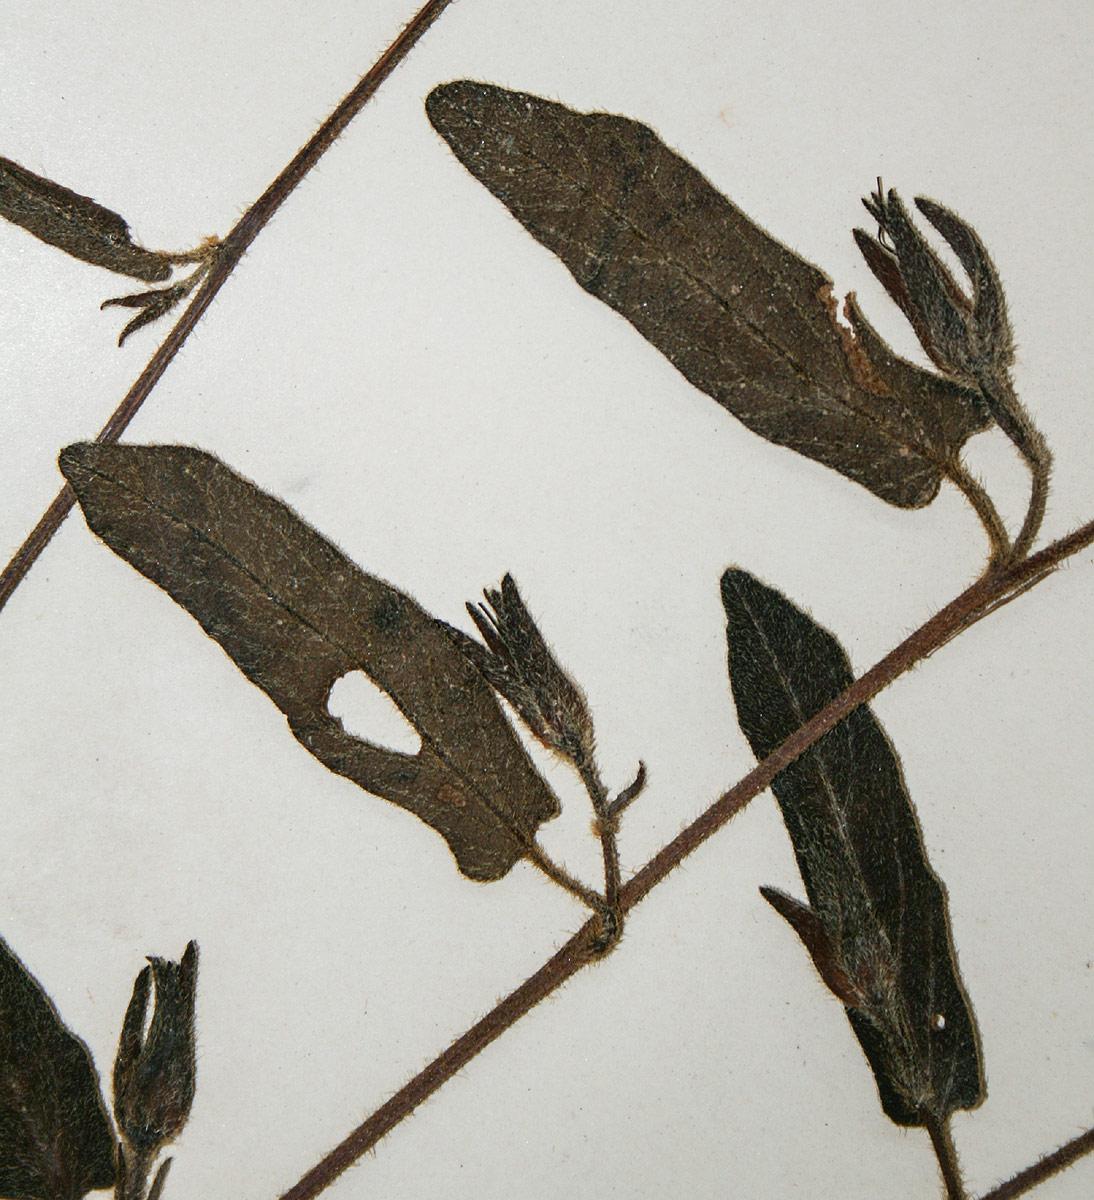 Ipomoea fulvicaulis var. asperifolia